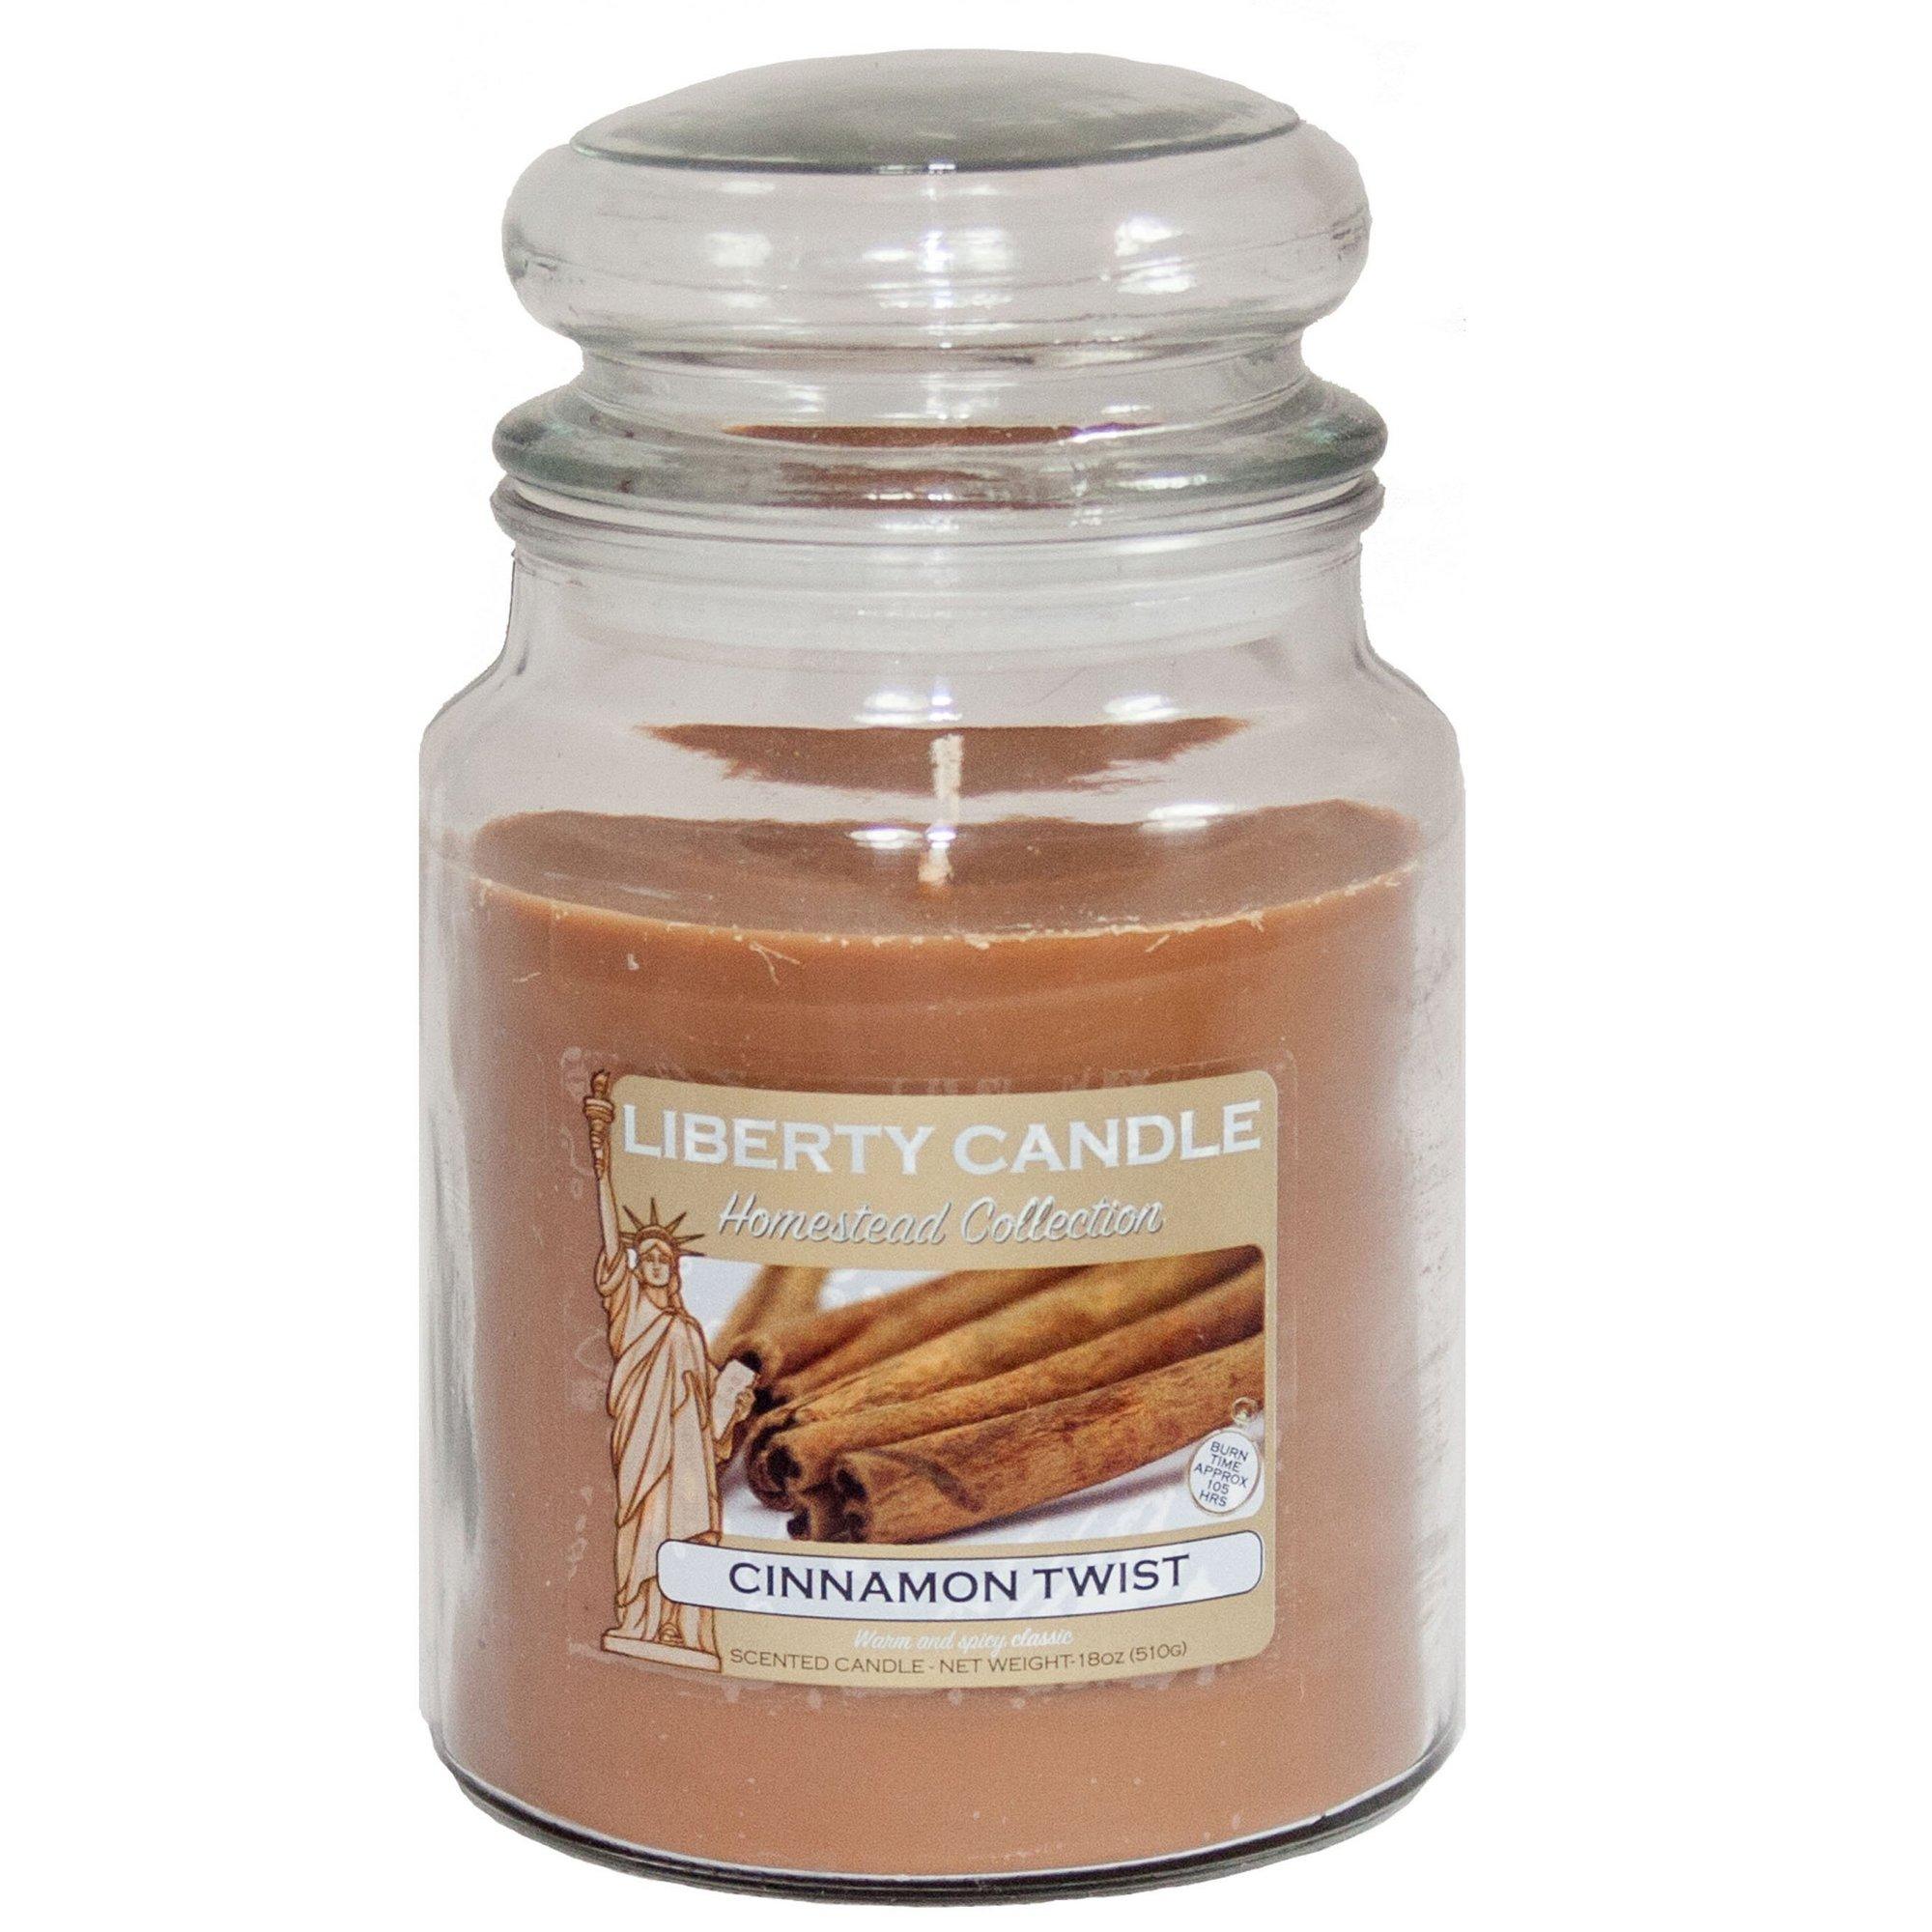 Image of 18oz Glass Jar Candle - Cinnamon Twist